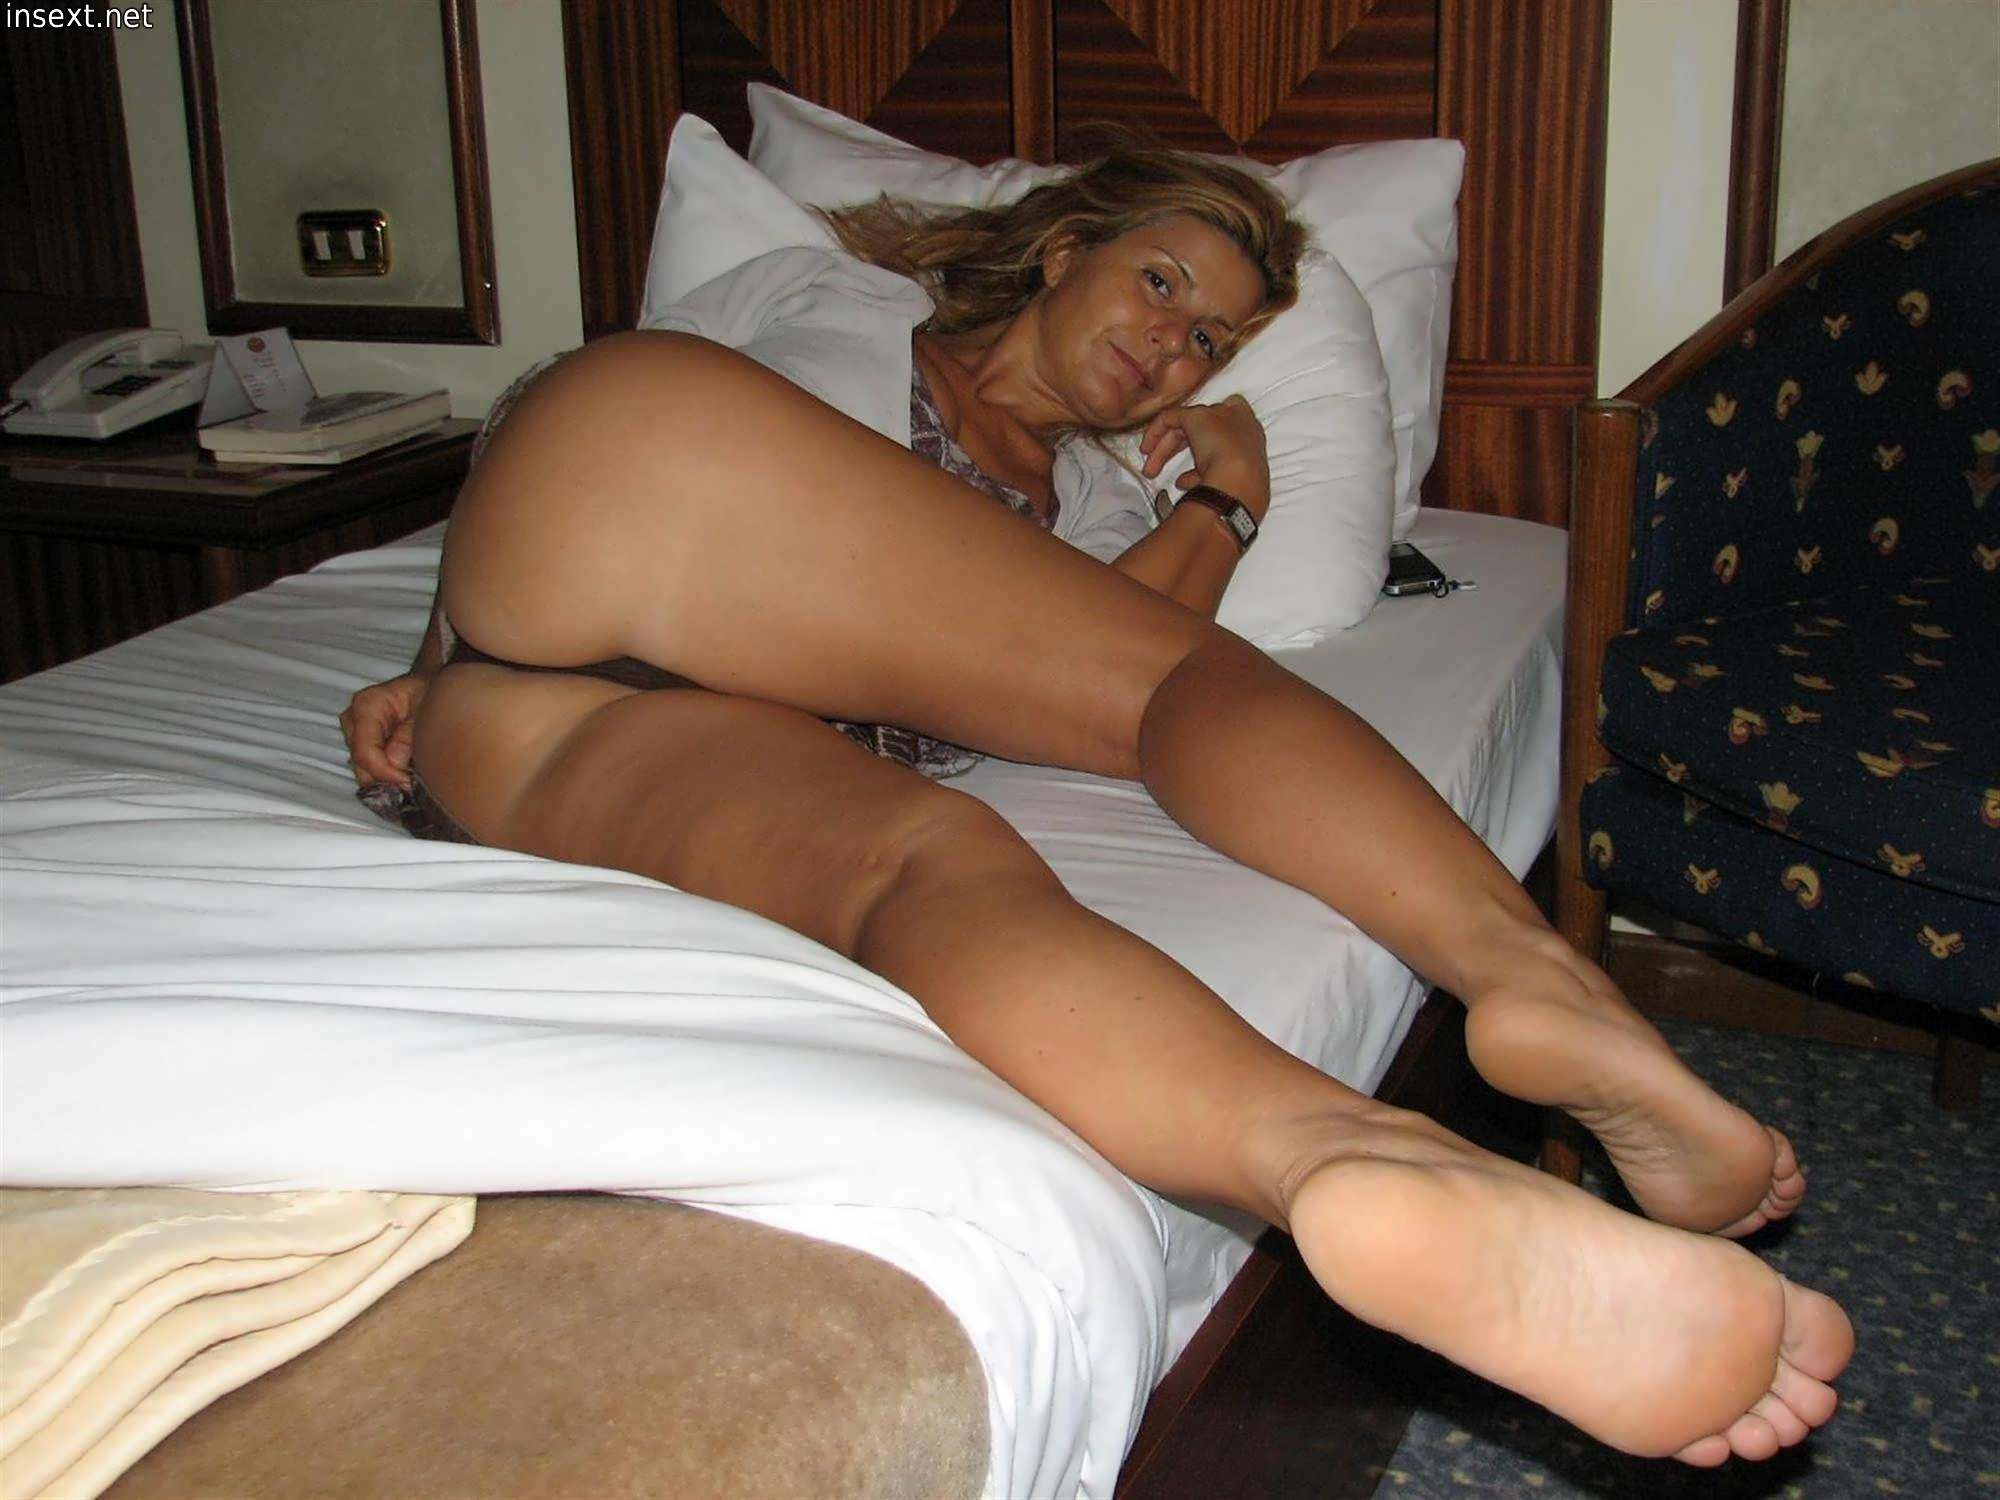 Jana linke sippl free mobile porn sex videos XXX